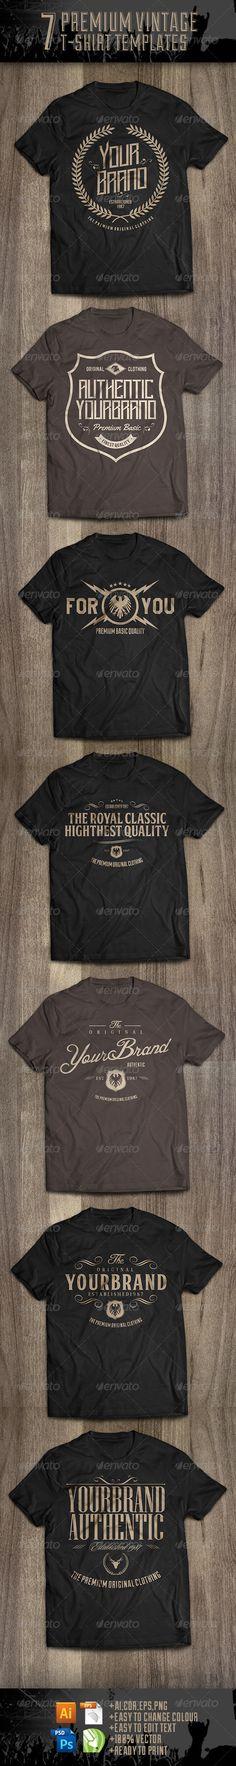 7 Premium T-Shirt Template PSD, Vector EPS, AI. Download here: http://graphicriver.net/item/7-premium-tshirt-template-v2/8568820?ref=ksioks